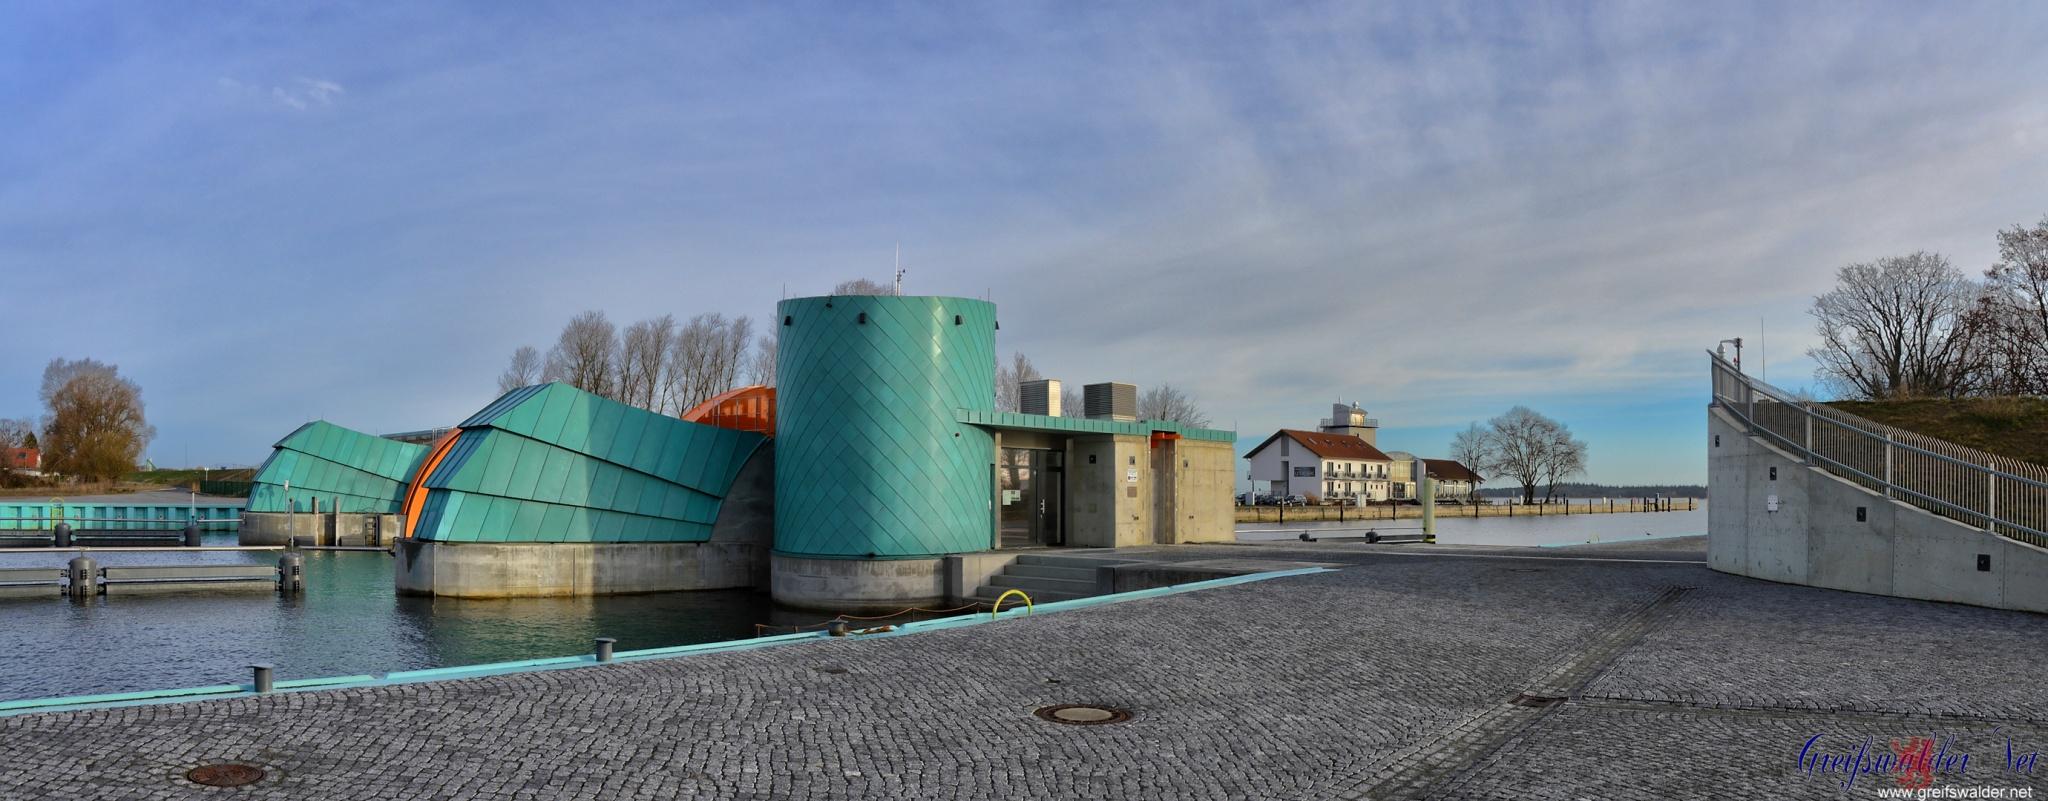 Sperrwerk, Utkiek und Mole in Greifswald-Wieck